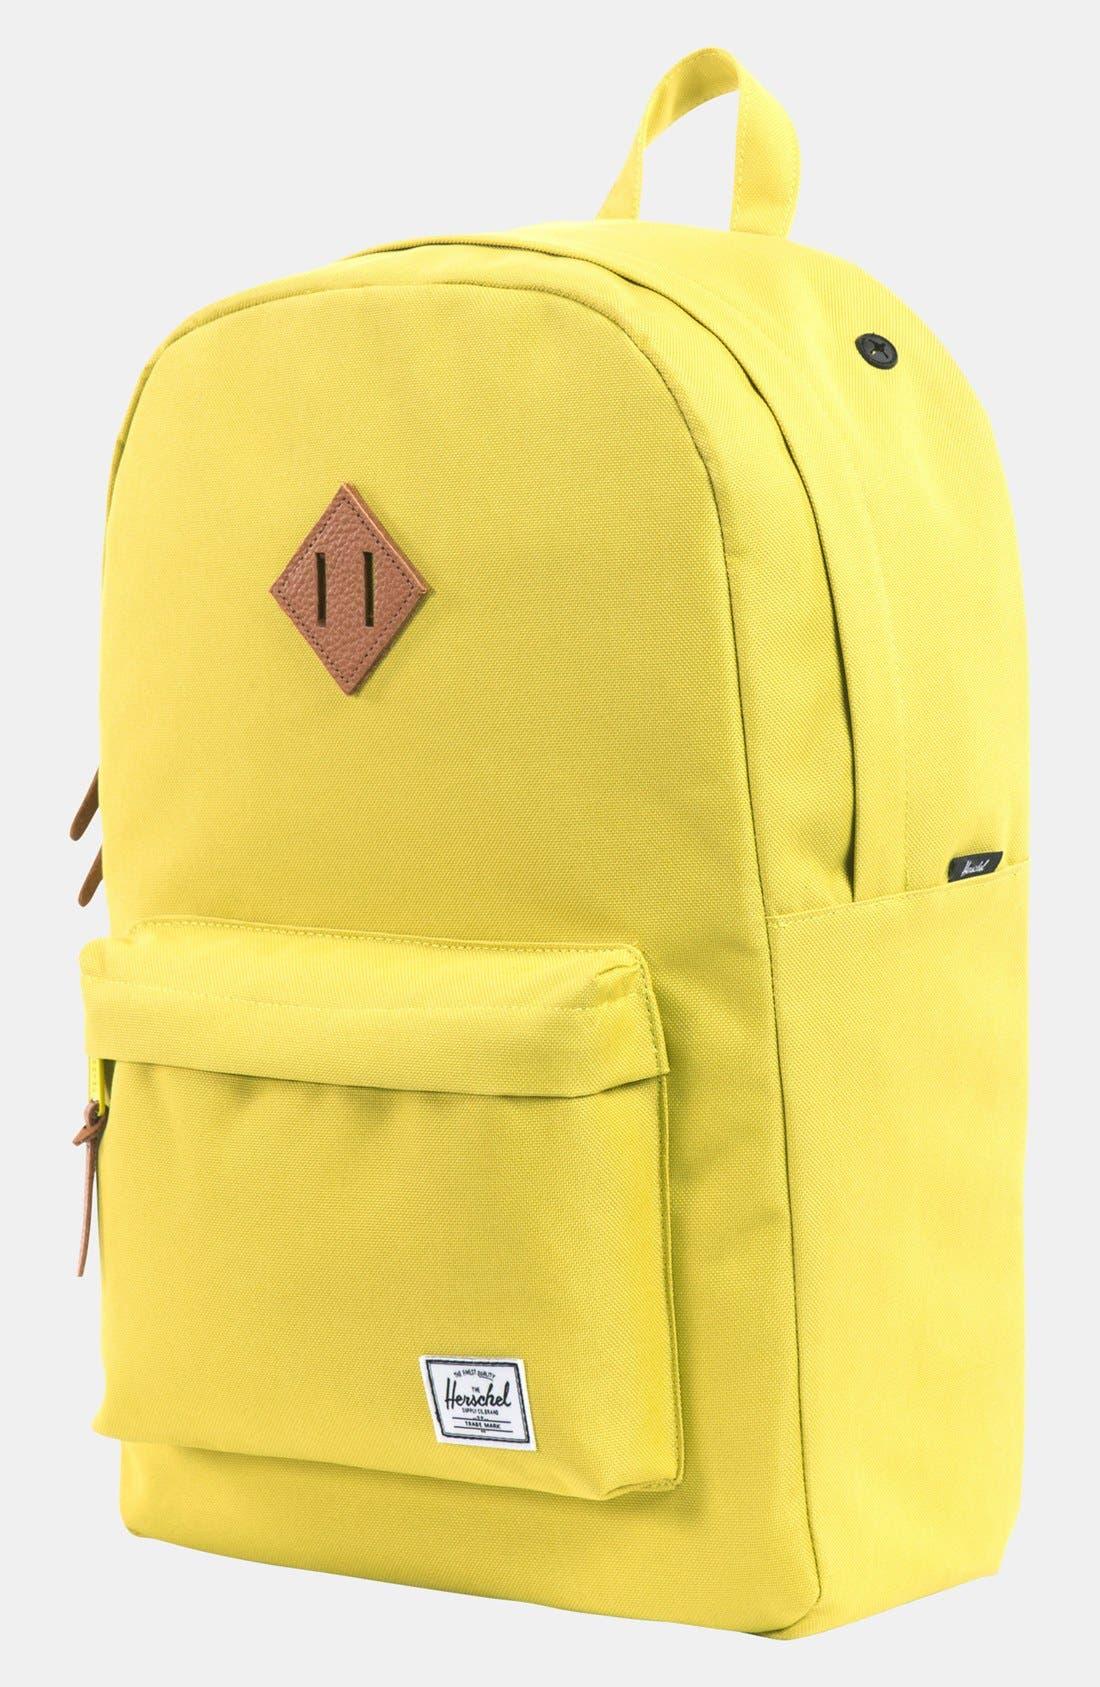 Alternate Image 1 Selected - Herschel Supply Co. 'Heritage Plus' Backpack